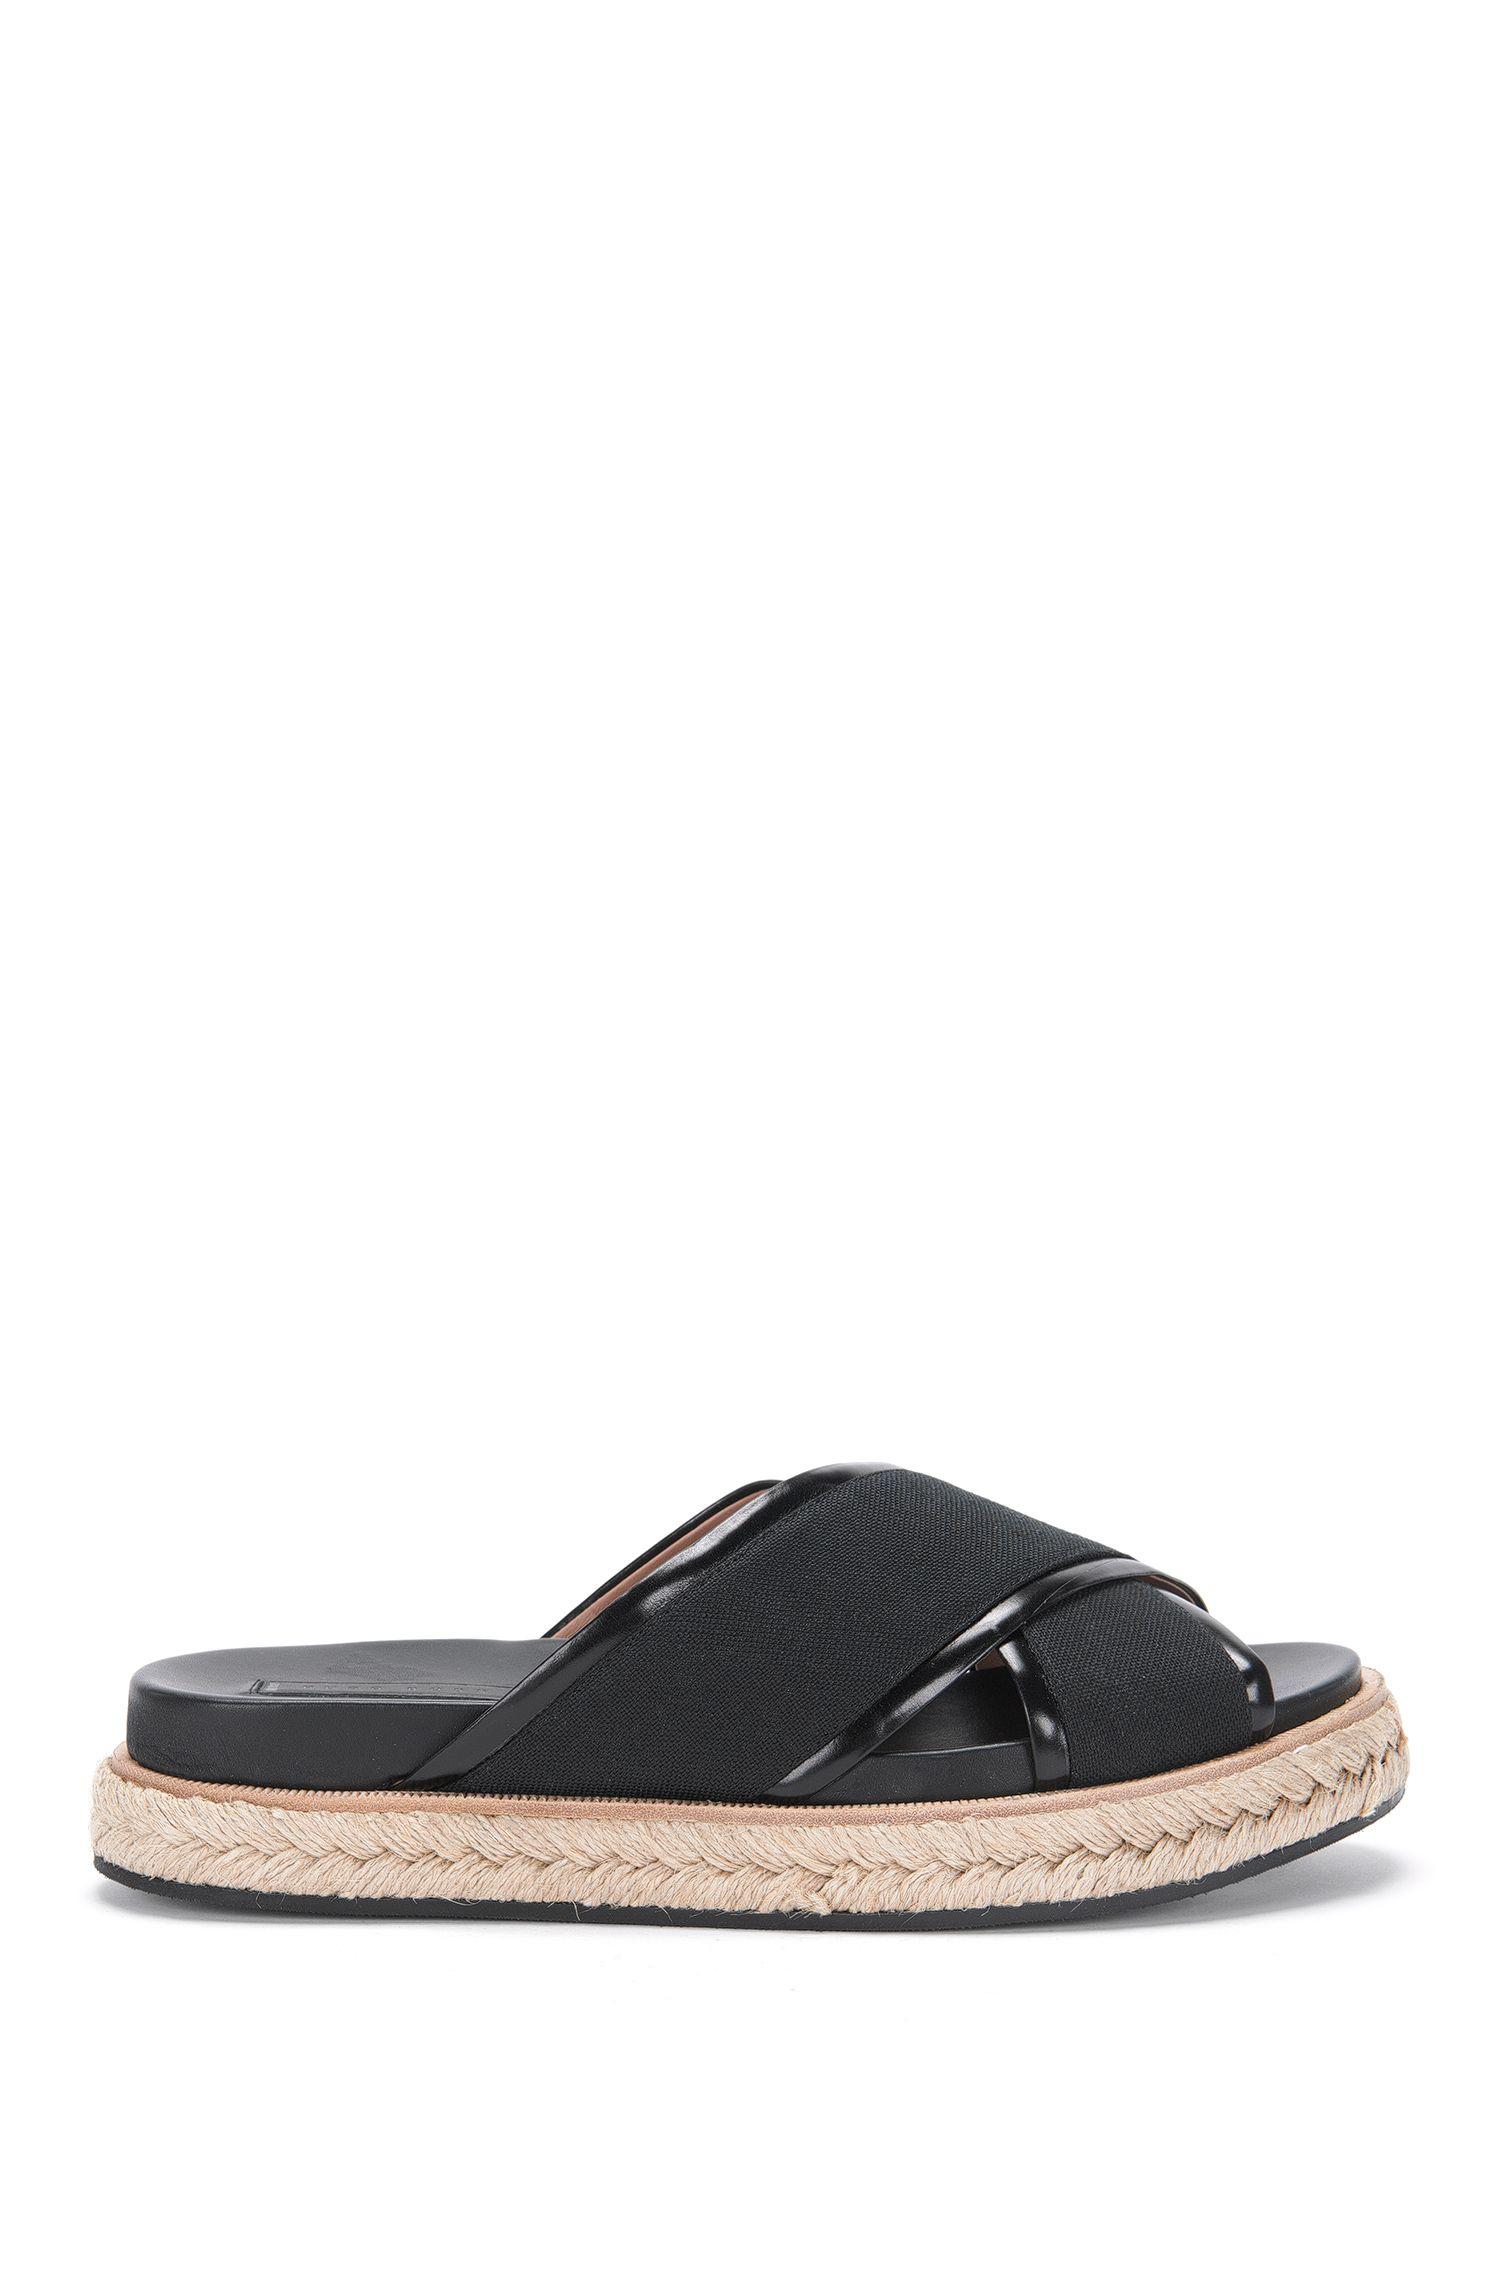 Sandalias de piel y lona: 'Crisscross Sandal LB'